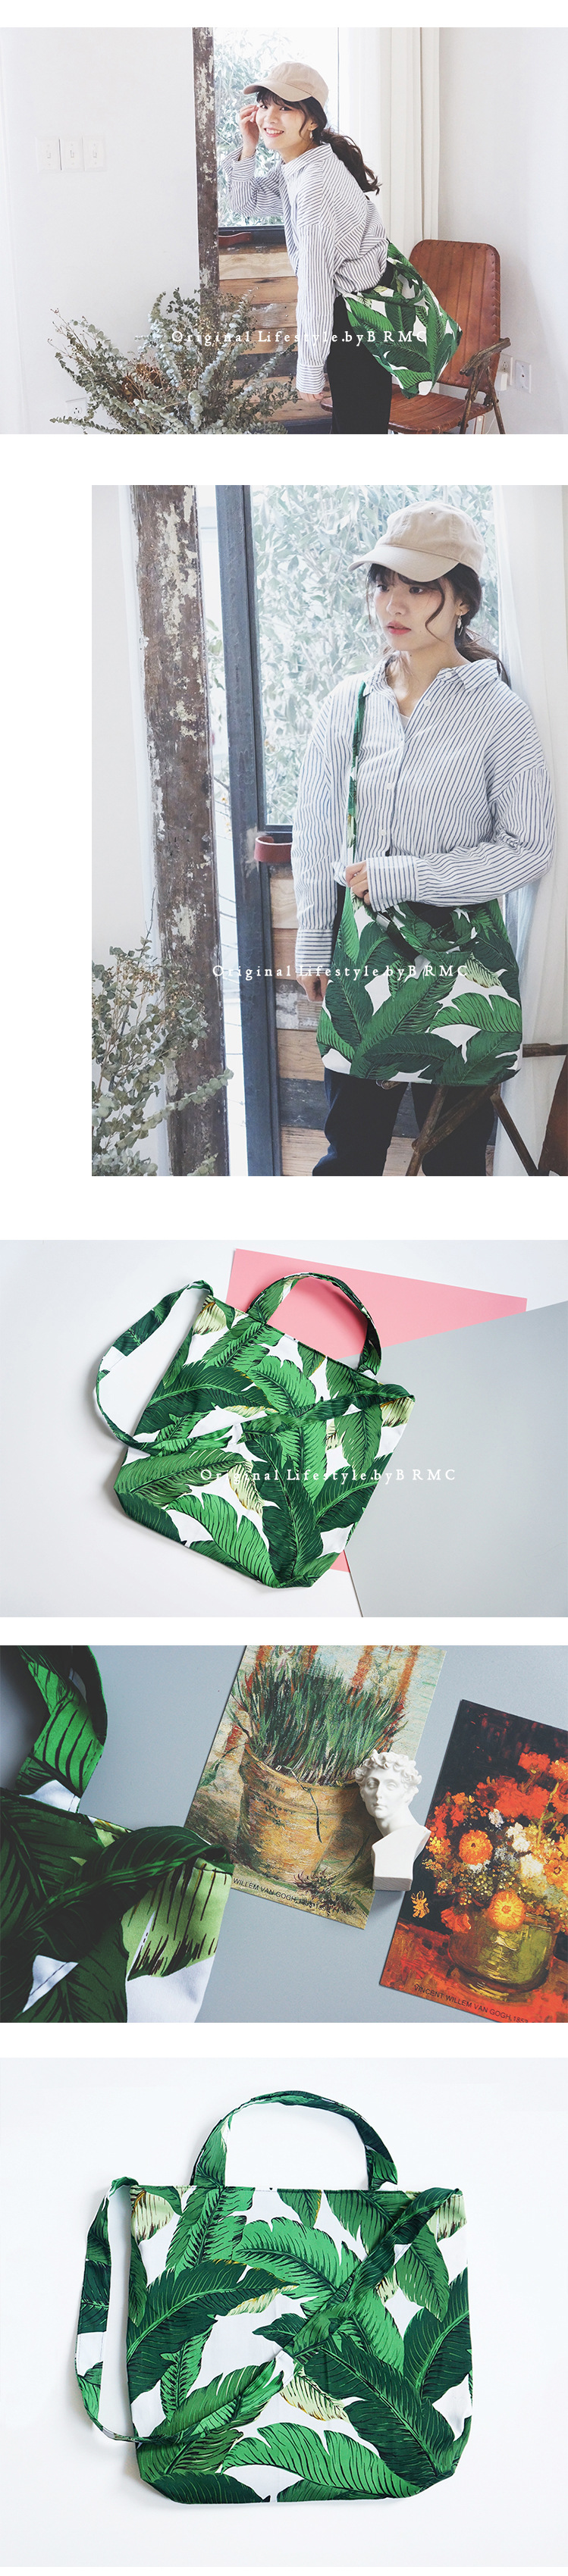 Green banana leaves polyester bag shopping foldable tote bags school teenage satchel inclined shoulder bag messenger bag (6)